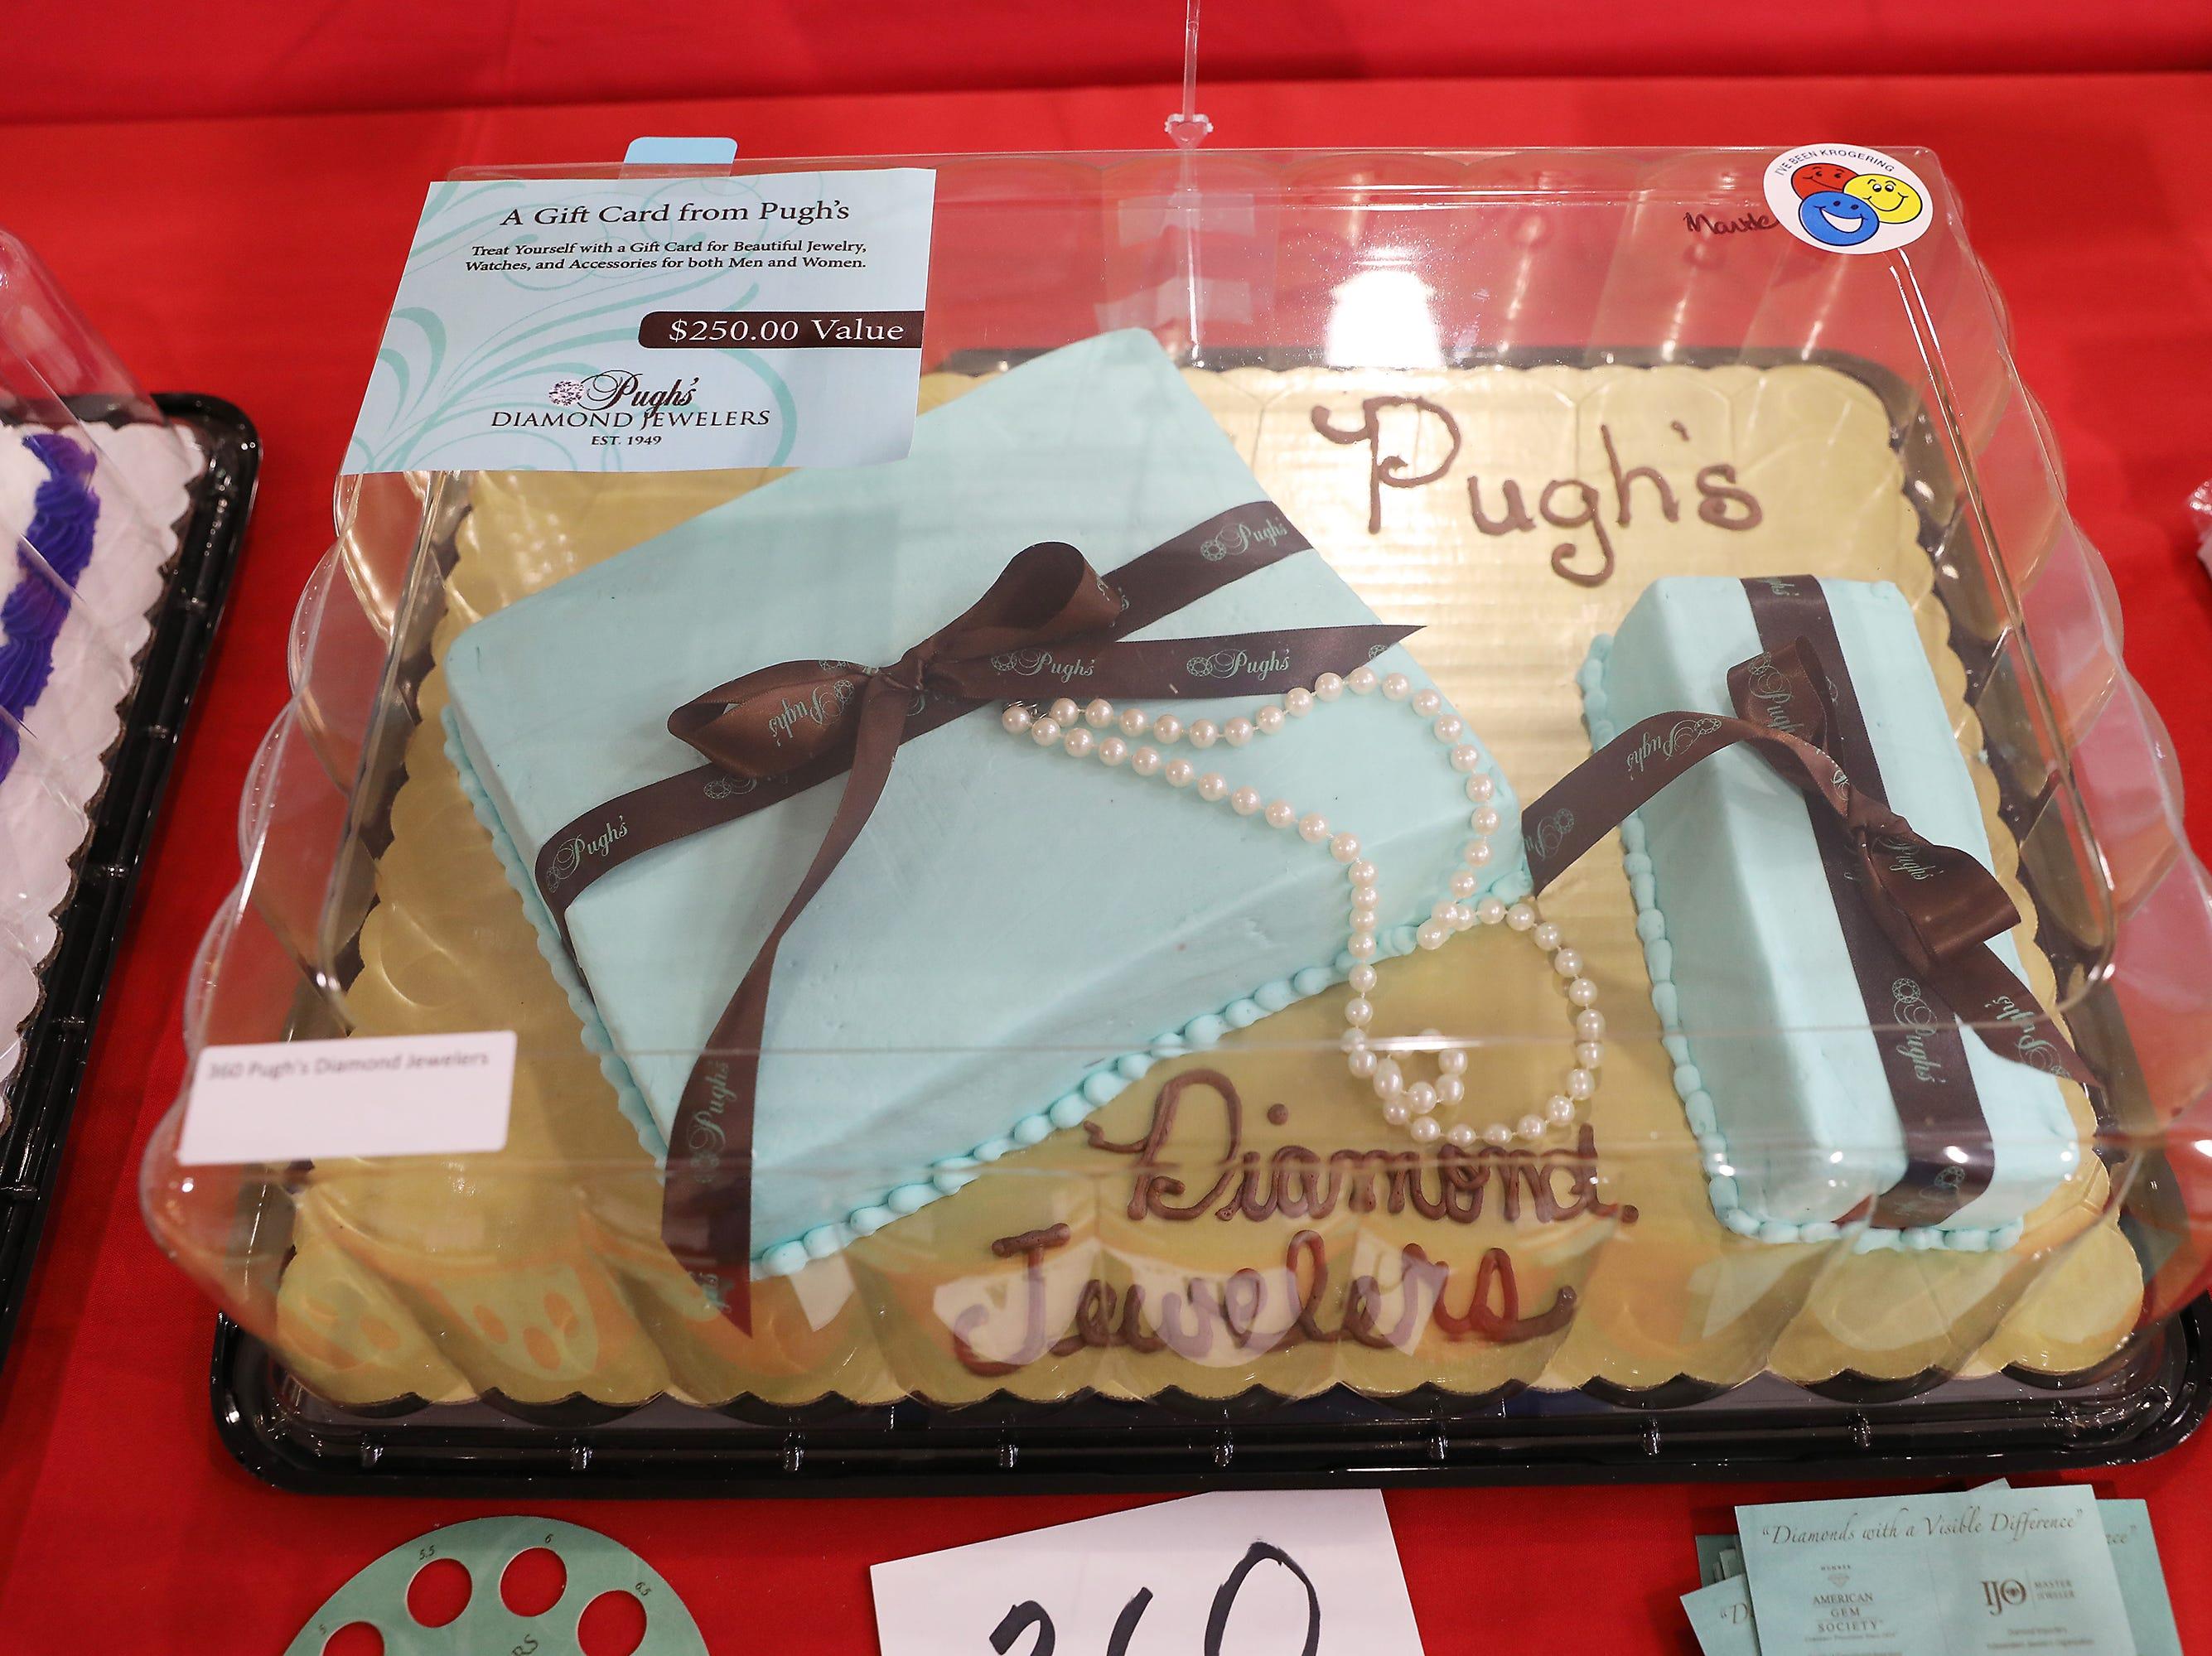 3:30 P.M. Friday cake 360 Pugh's Diamond Jewelers - $250 Pugh's gift card